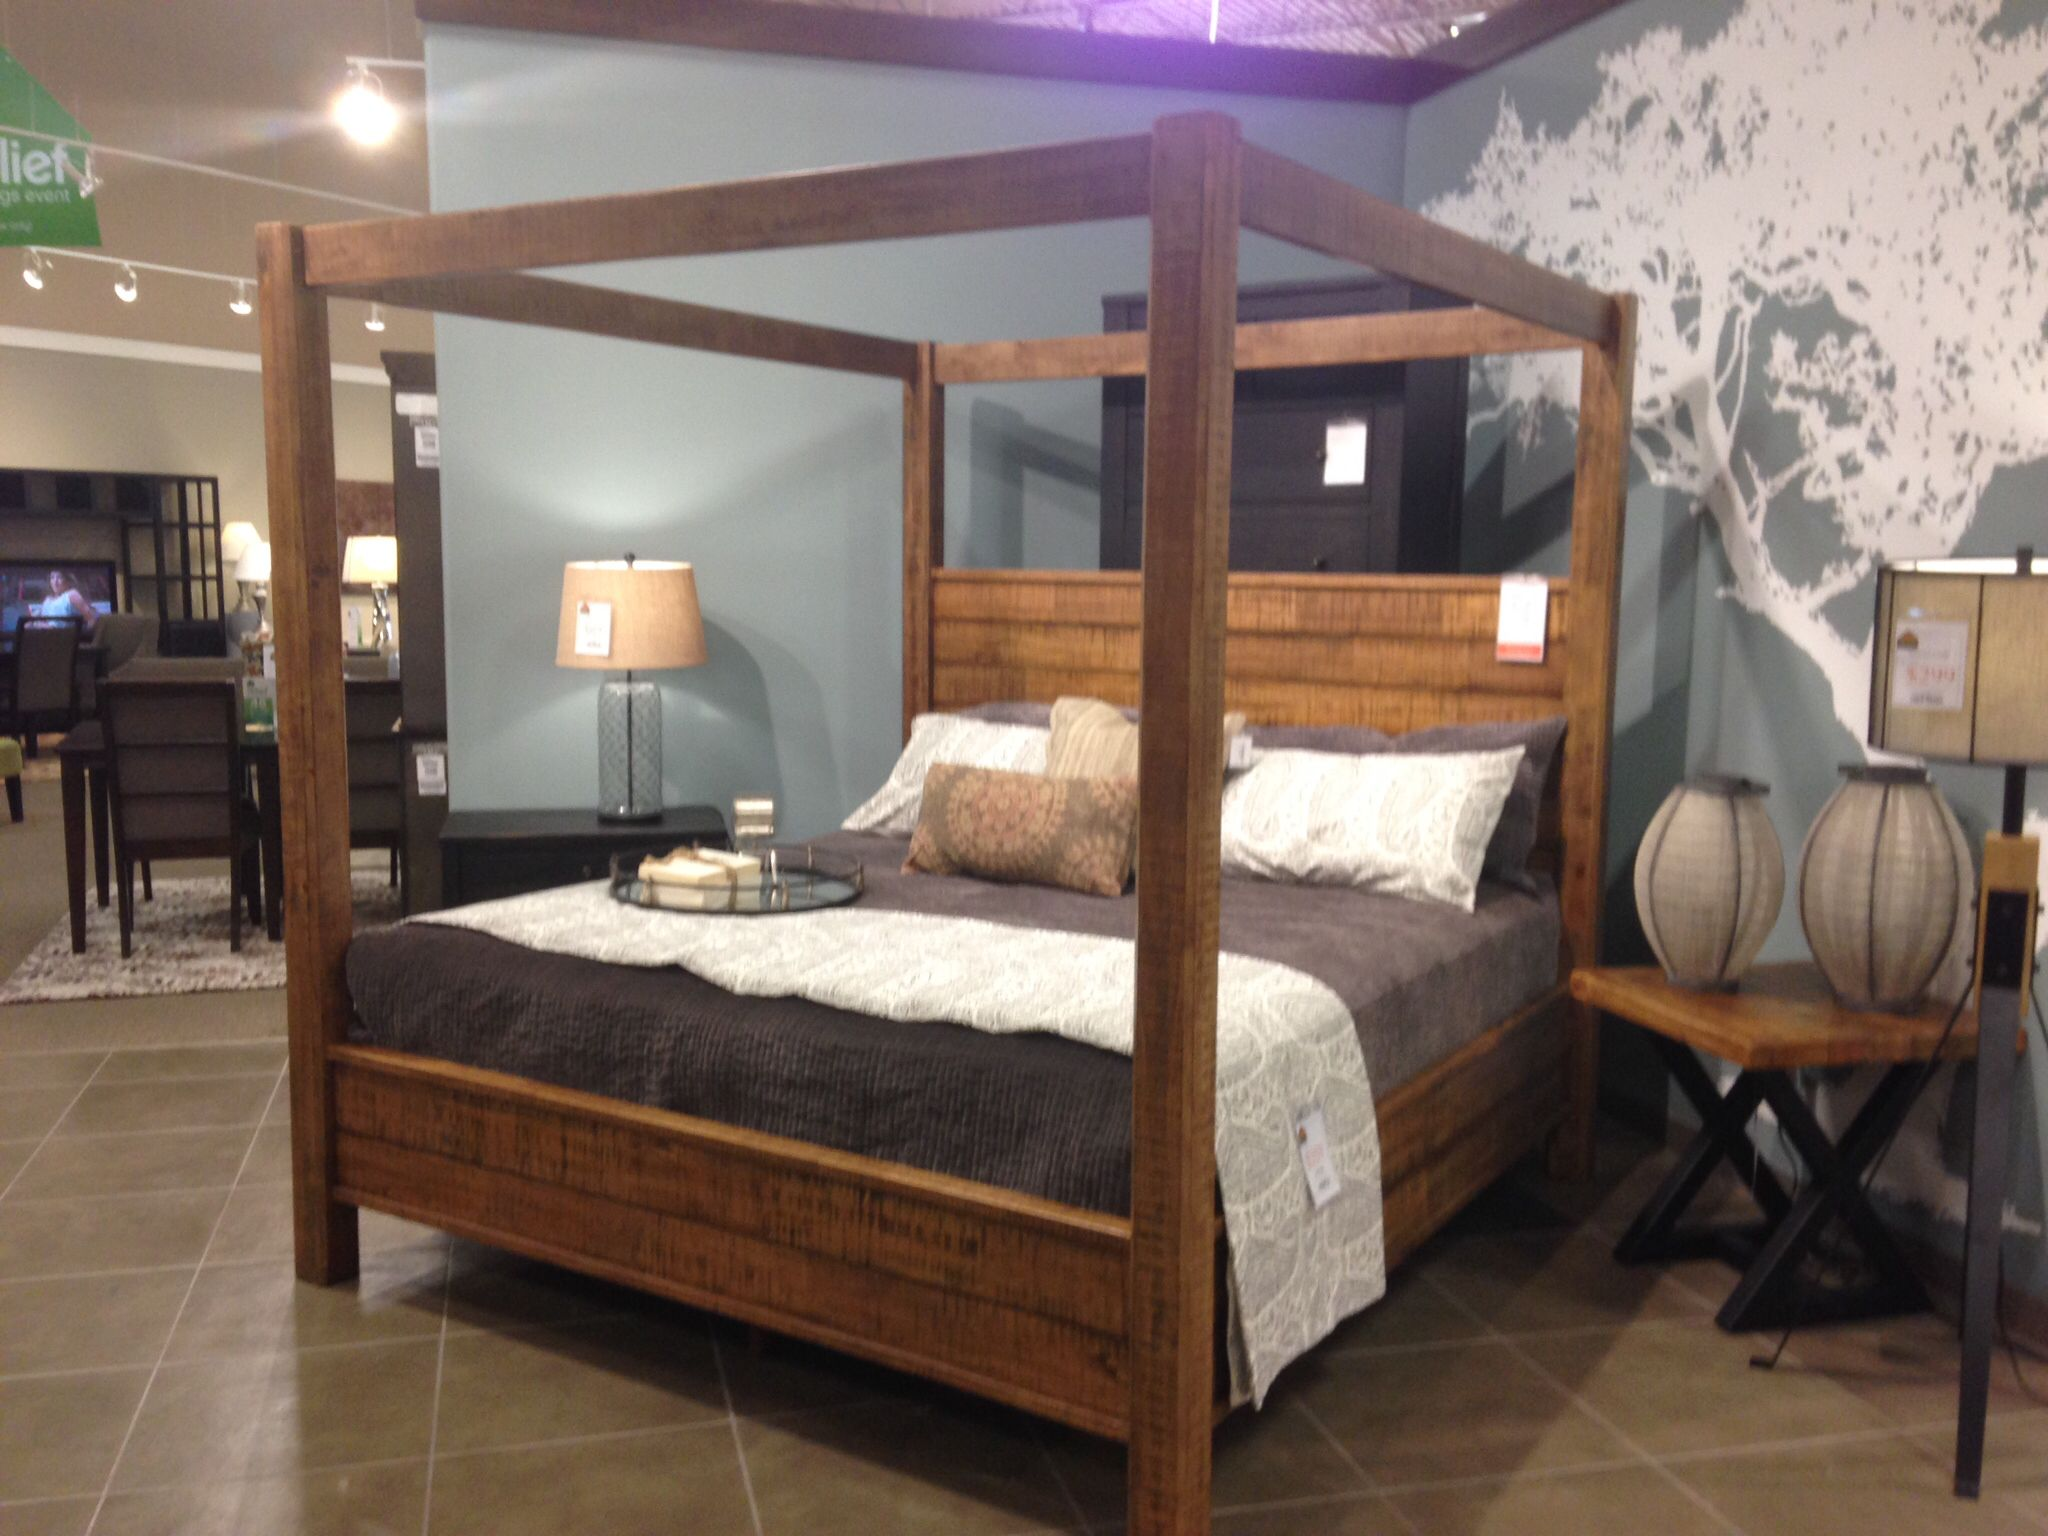 Ashley rustic bedroom furniture - Furniture